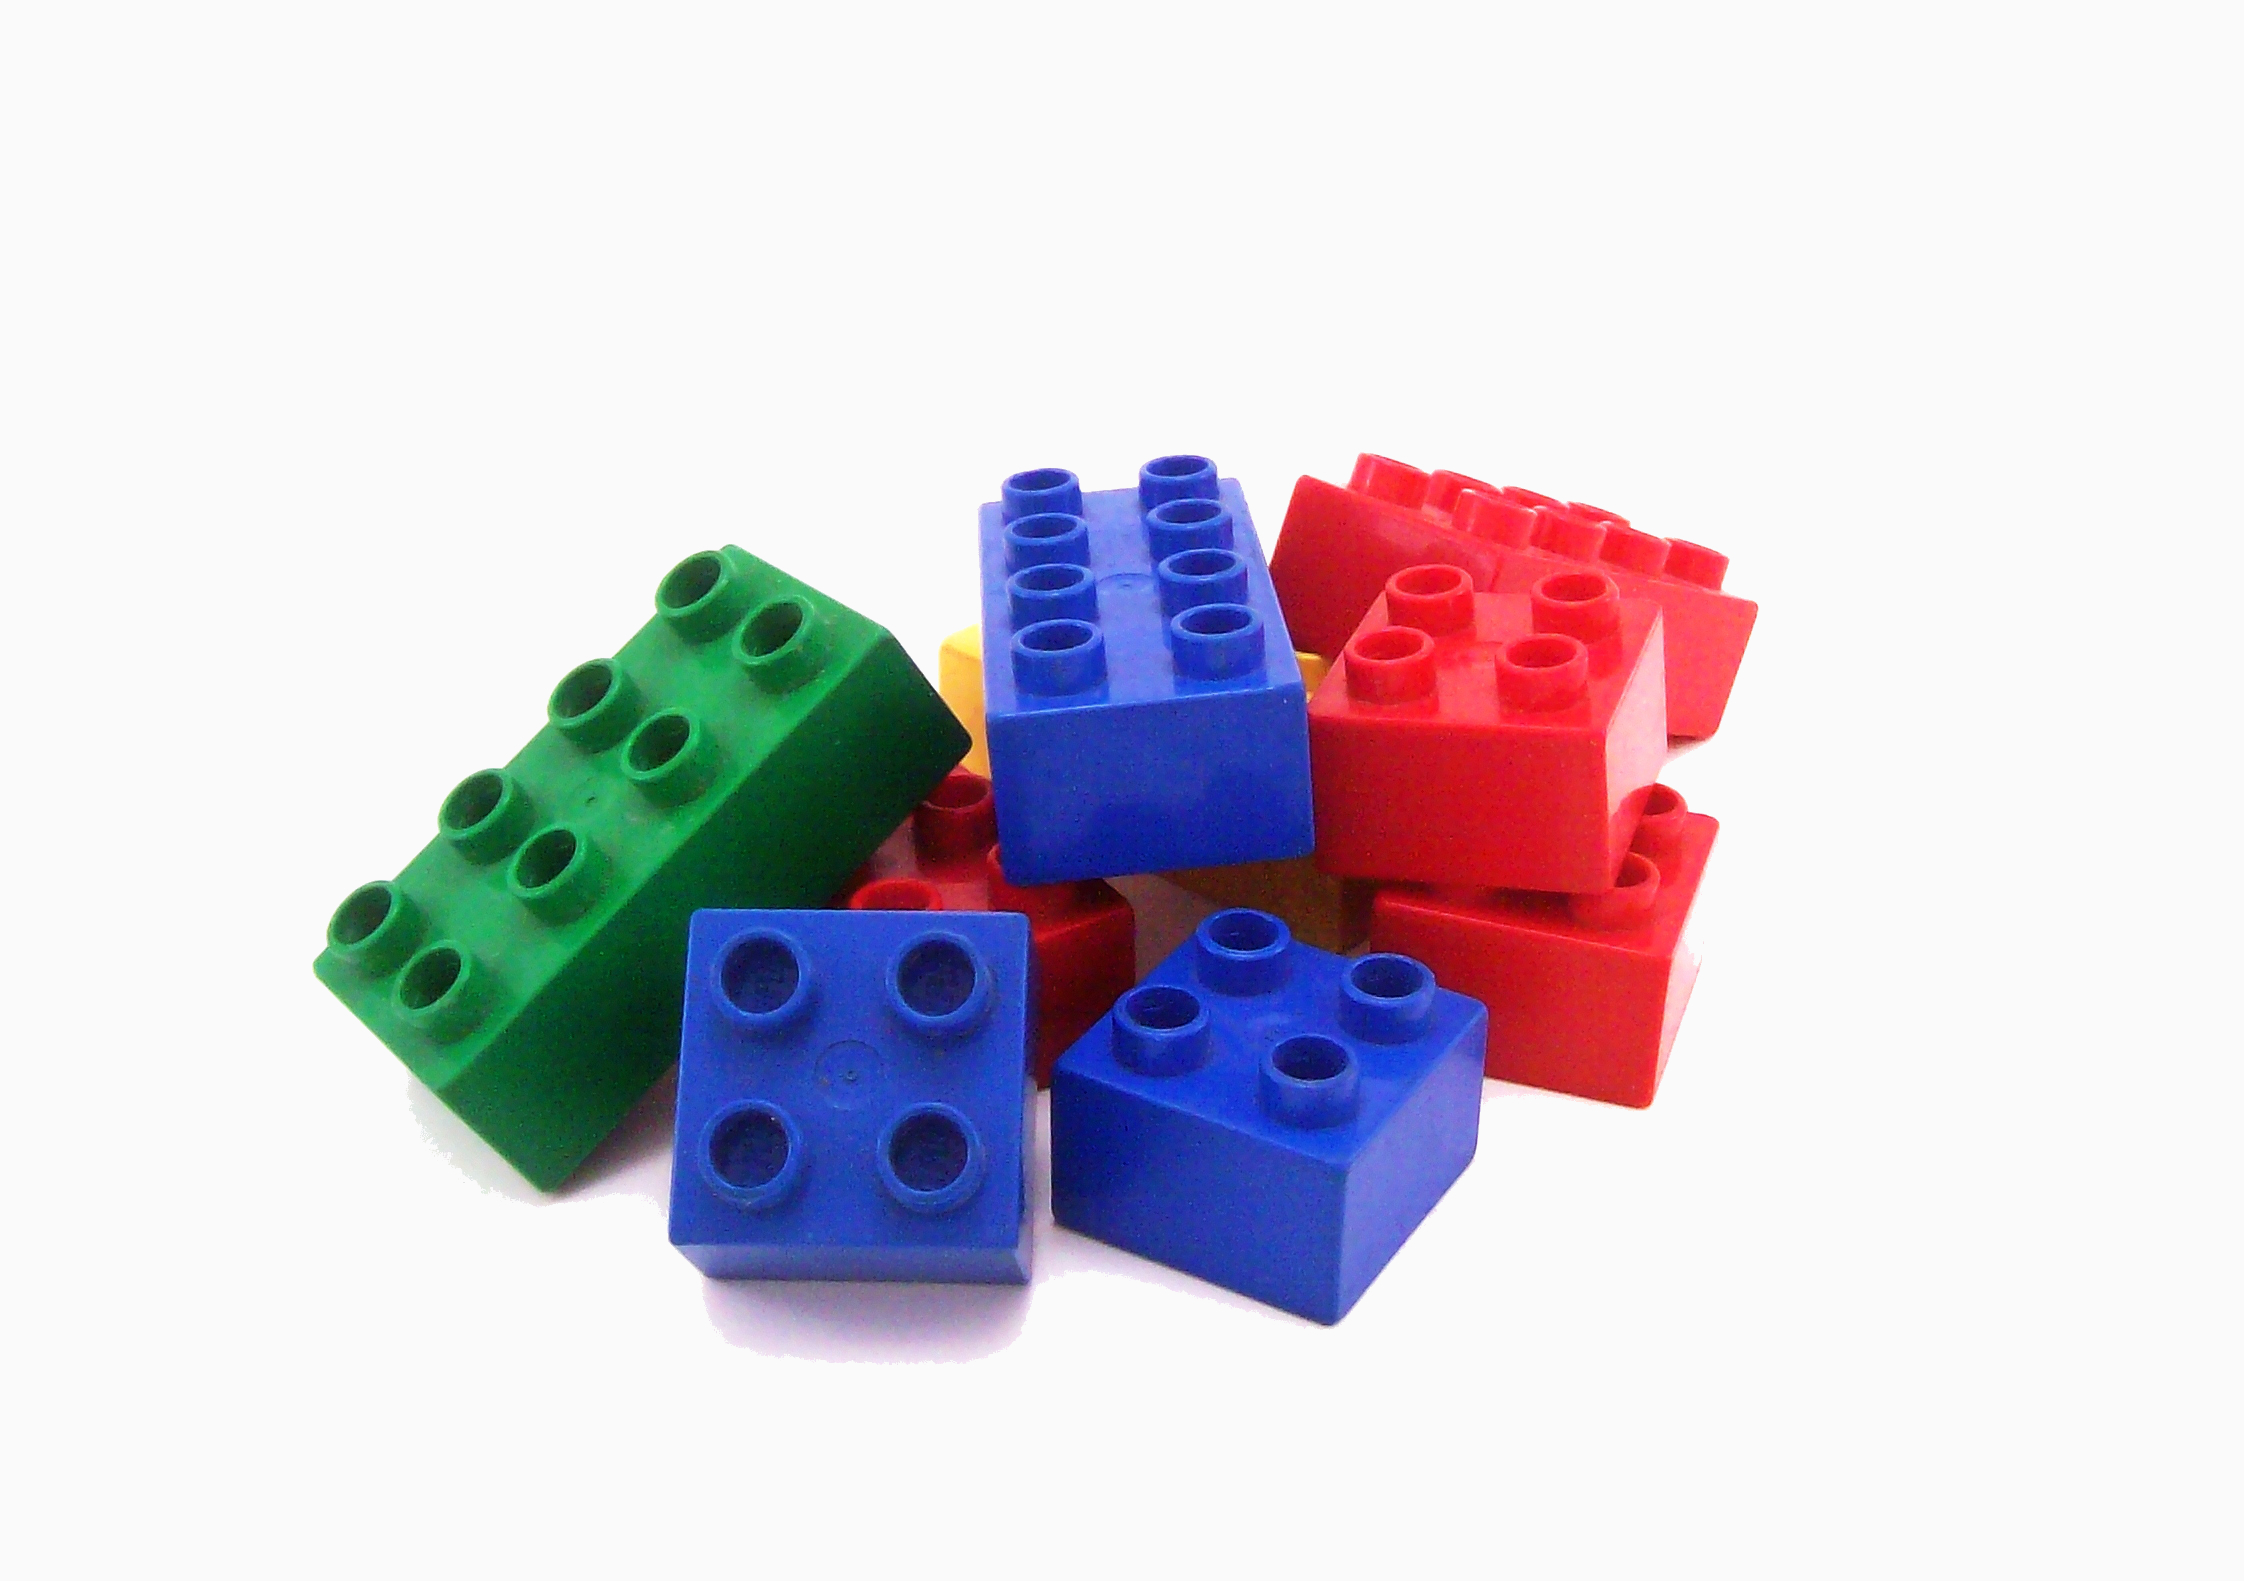 Lego clip art borders the cliparts 2